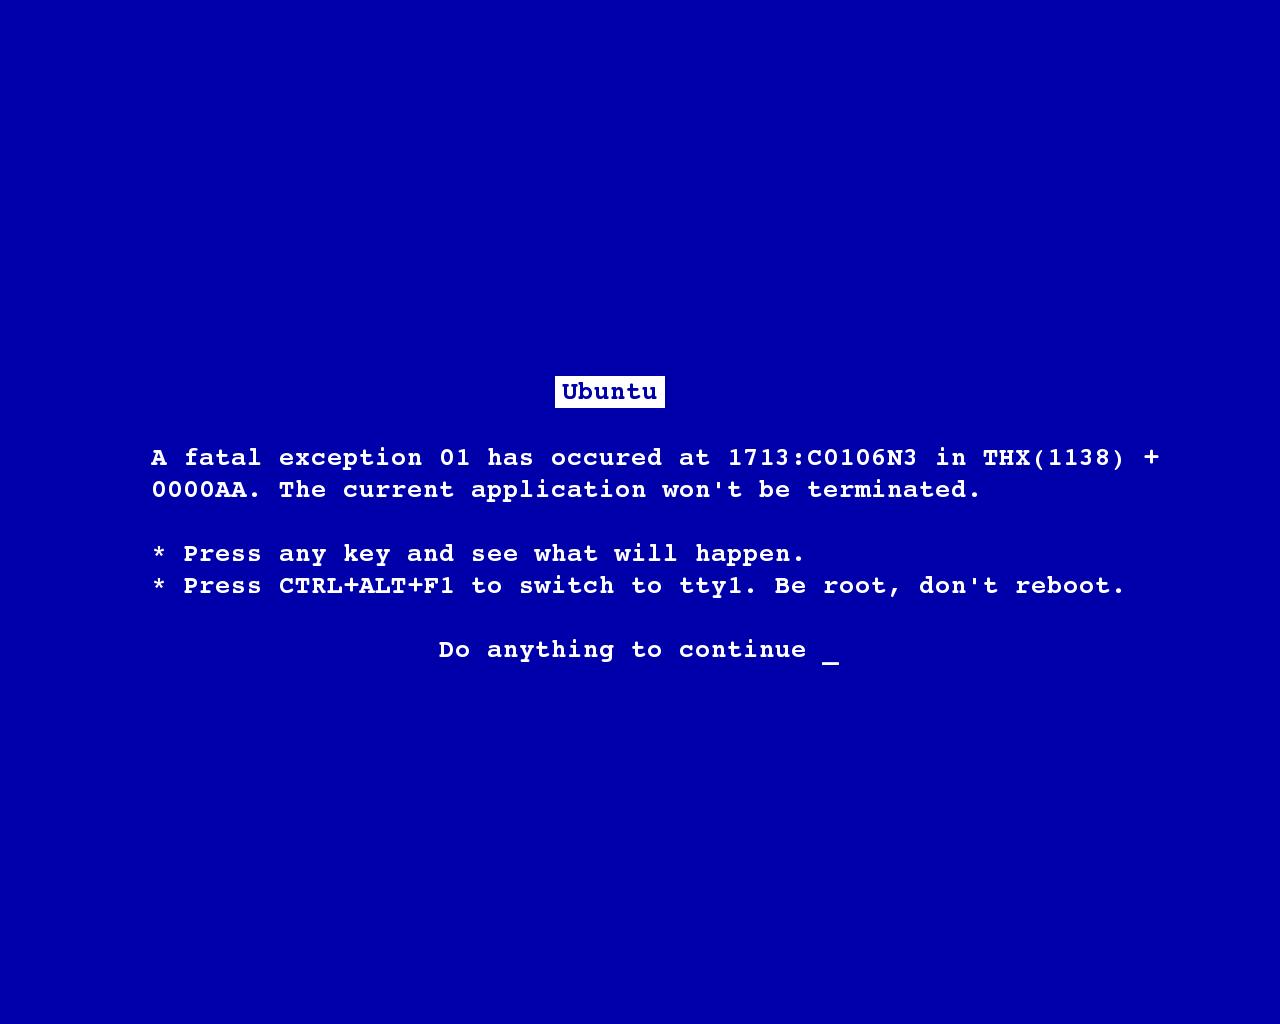 Blue Screen of Death   Wallpaper 42420 1280x1024